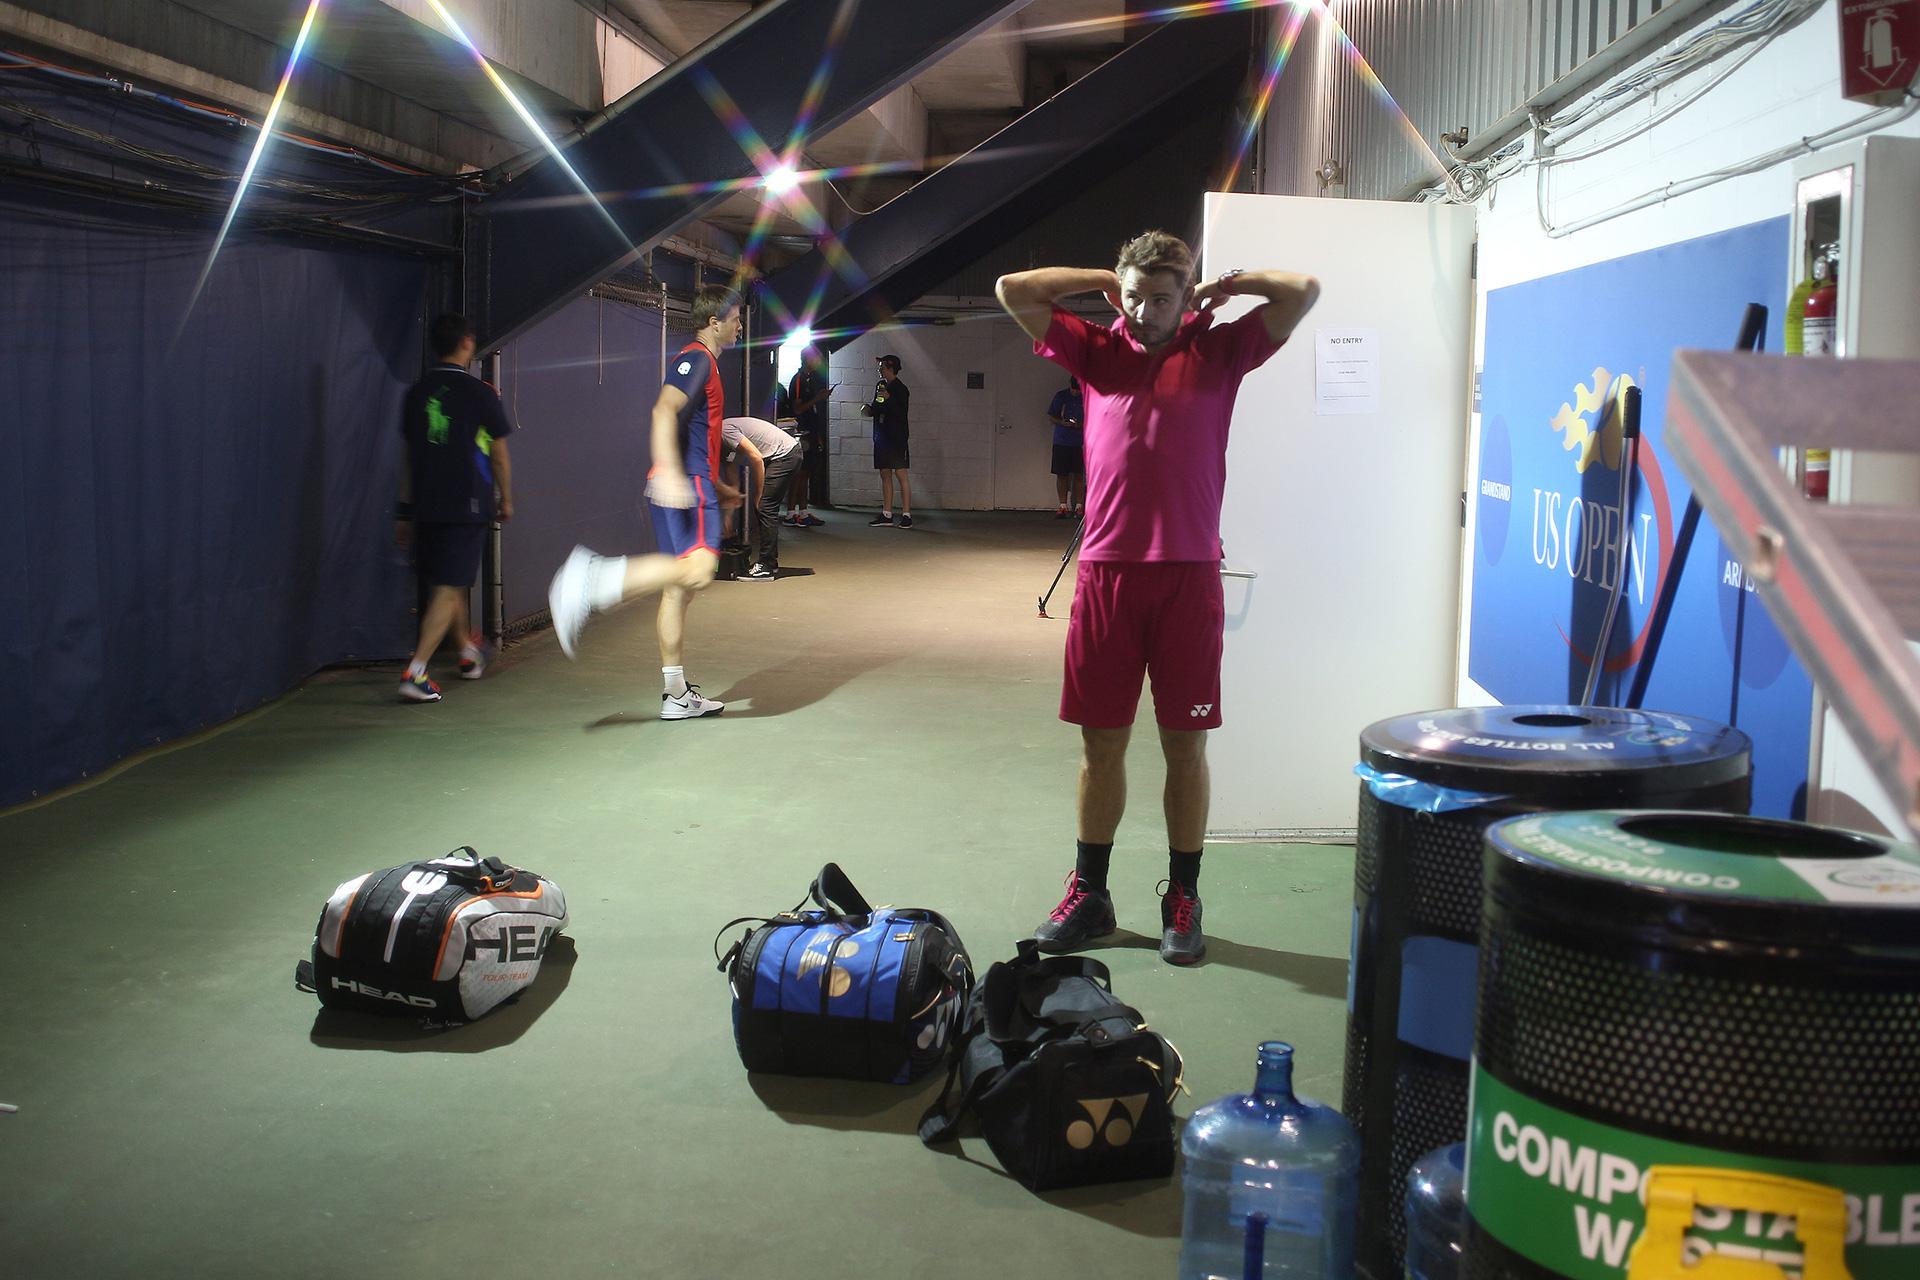 040916_Tennis_USOpen_4498